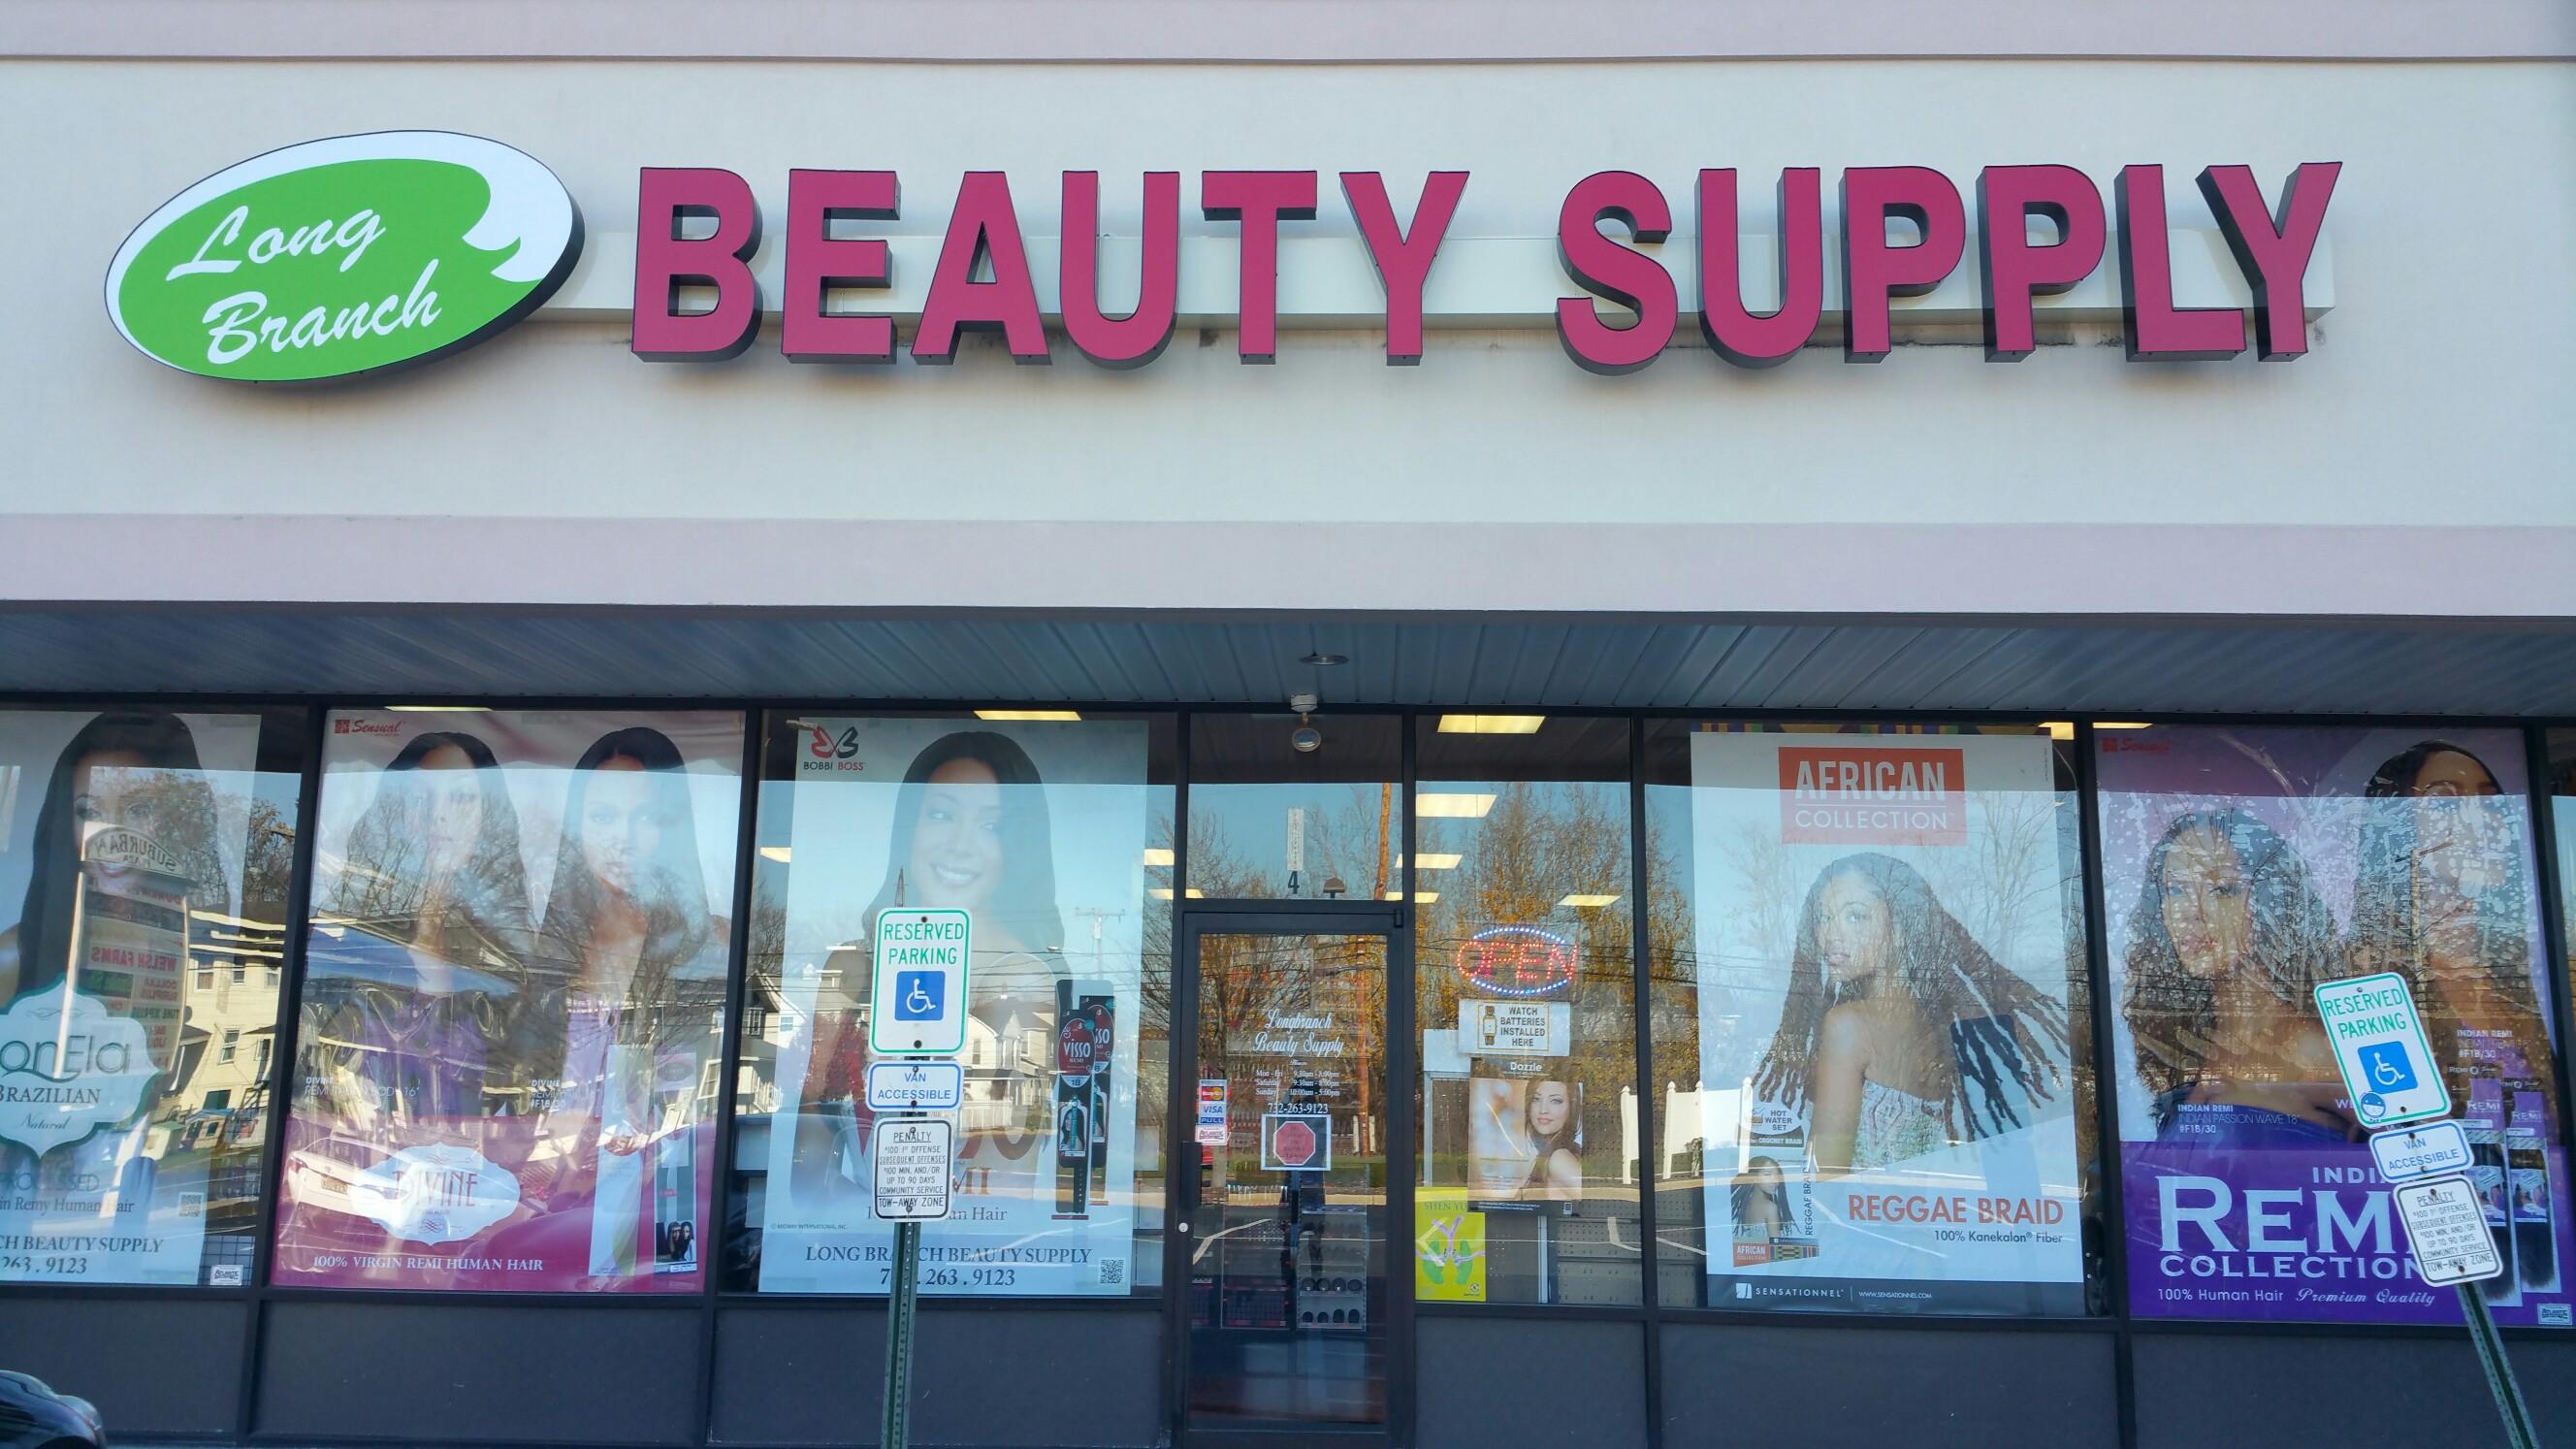 Long Branch Beauty Supply 492 Joline Ave Long Branch Nj